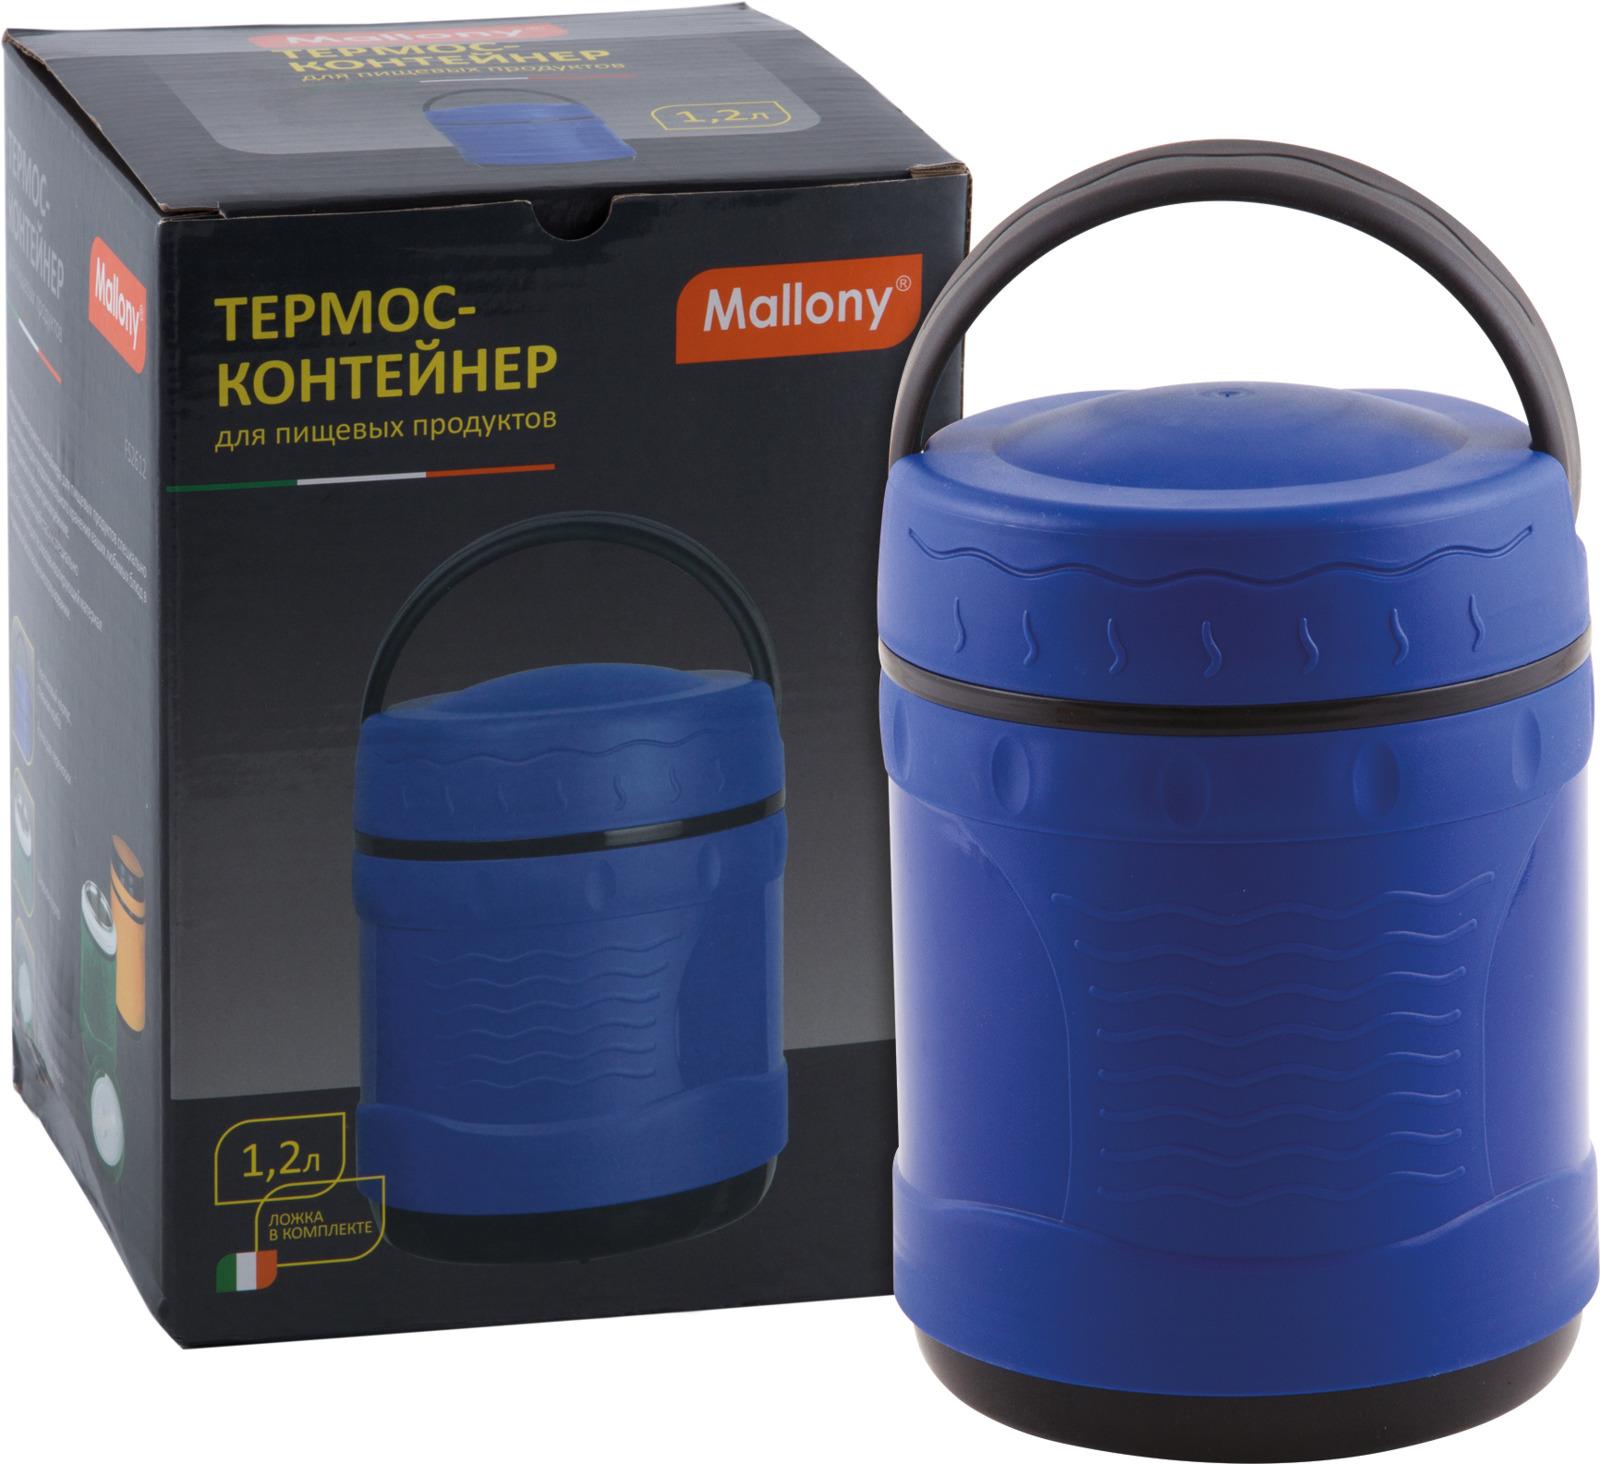 Термос Mallony, цвет: синий, 1,2 л mallony термос t85100 1 0 л широкое горло mallony